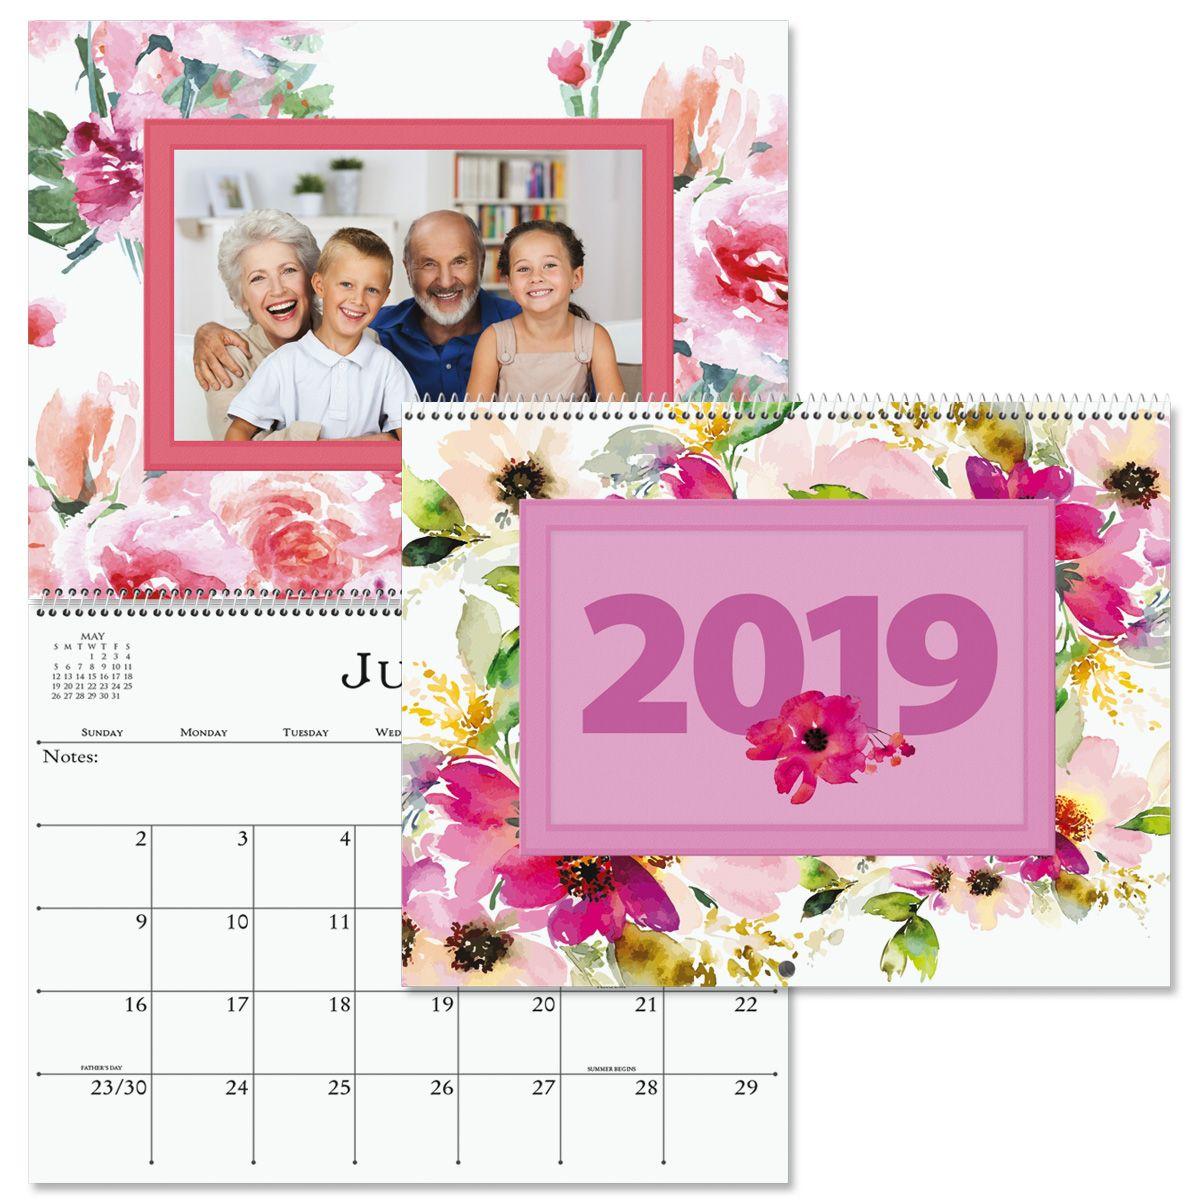 2019 Floral Photo Calendar